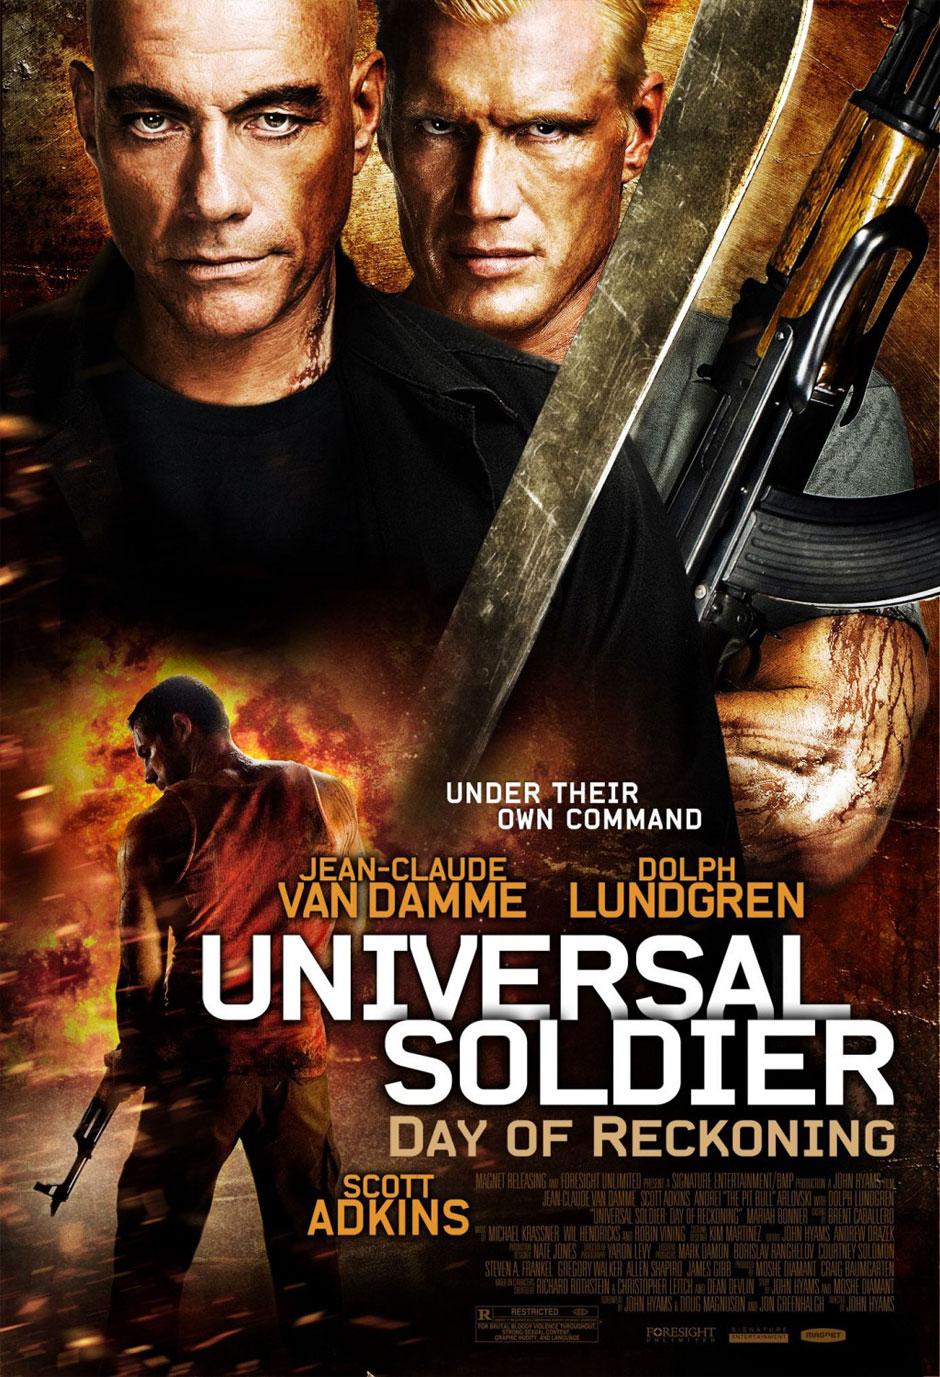 Watch Universal Soldier Day of Reckoning Movie Online Free 2012